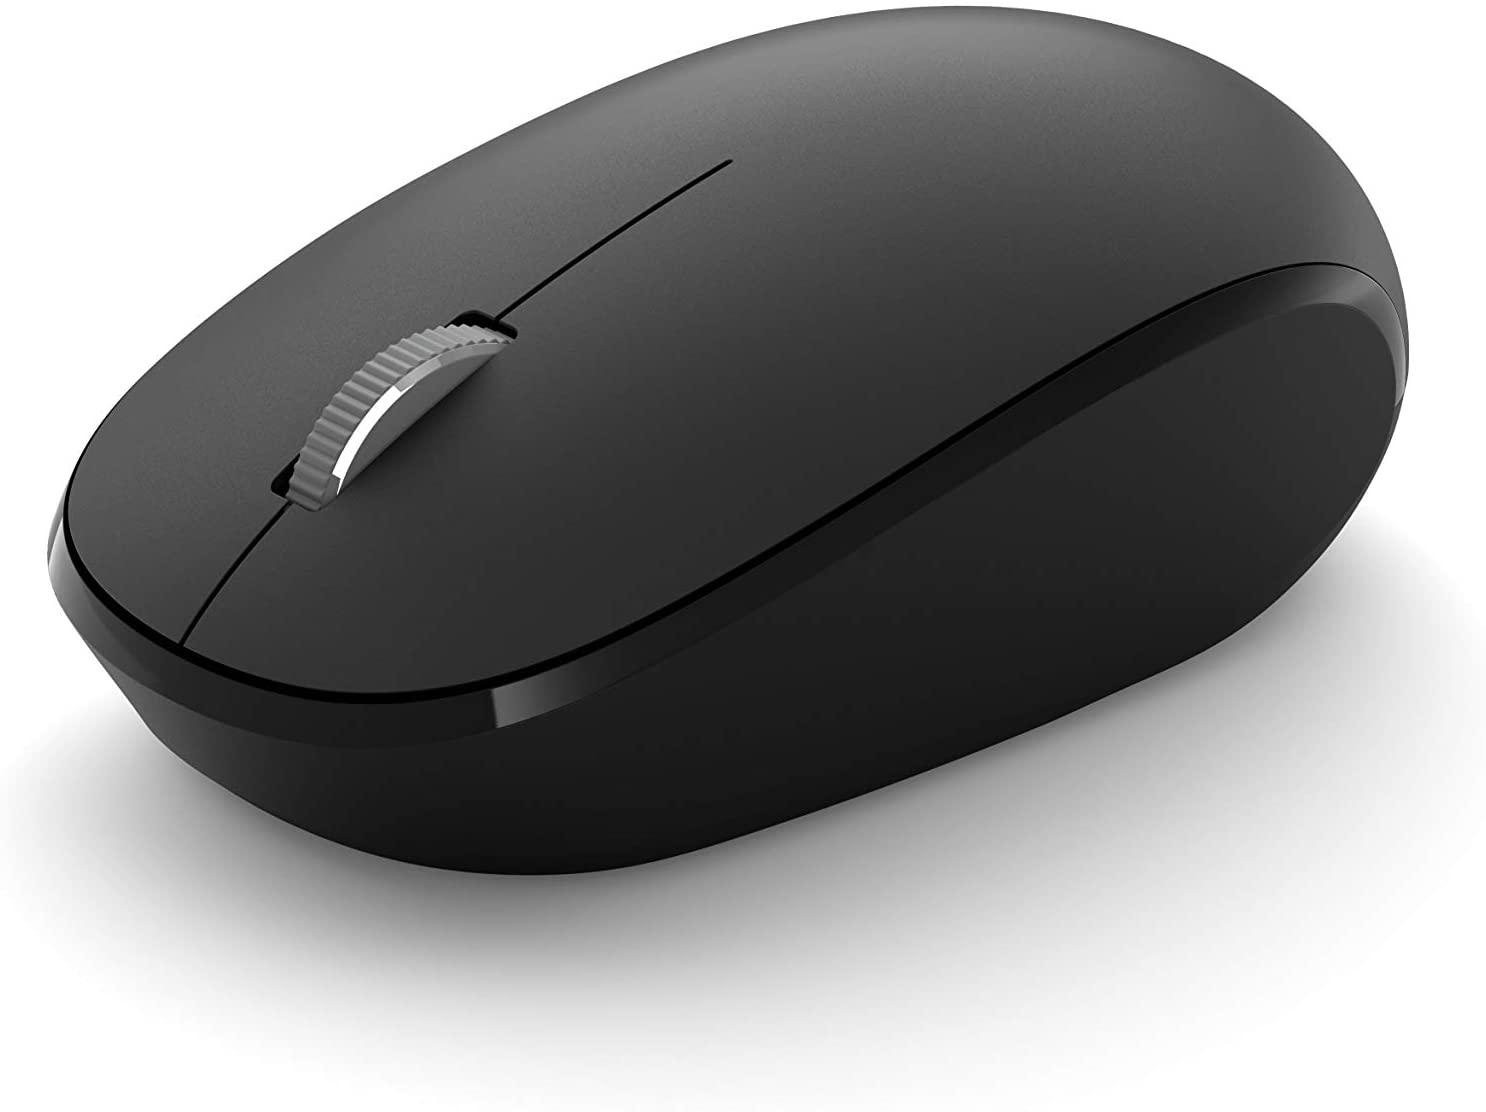 Microsoft Bluetooth Mouse เมาส์ไร้สาย สีดำ ของแท้ ประกันศูนย์ 3ปี (Black)